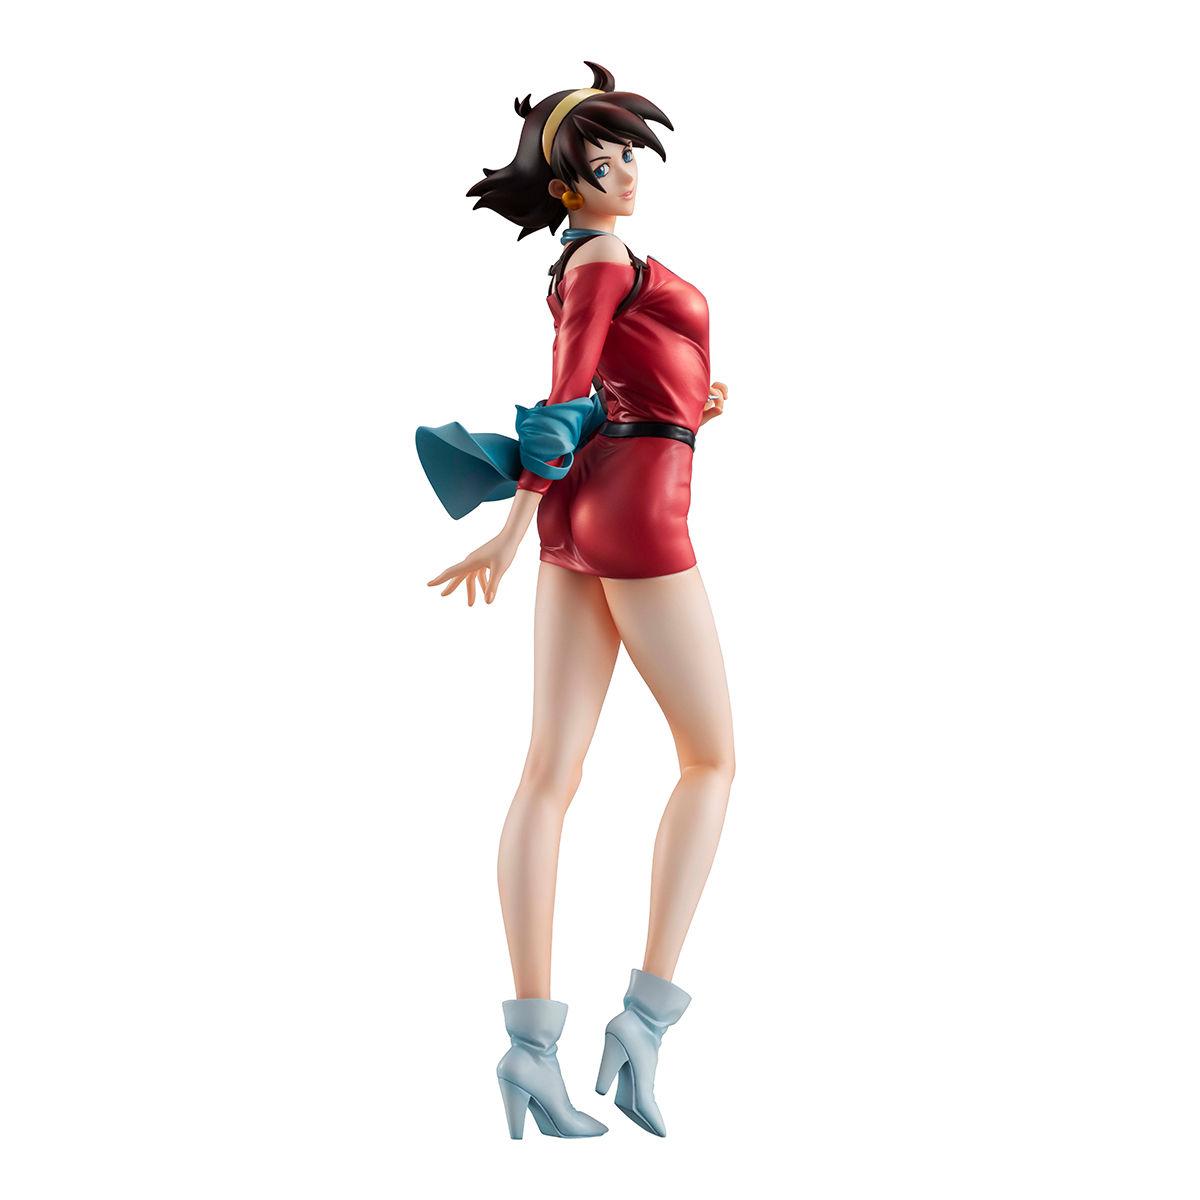 GGG『レイン・ミカムラ』機動武闘伝Gガンダム 完成品フィギュア-002